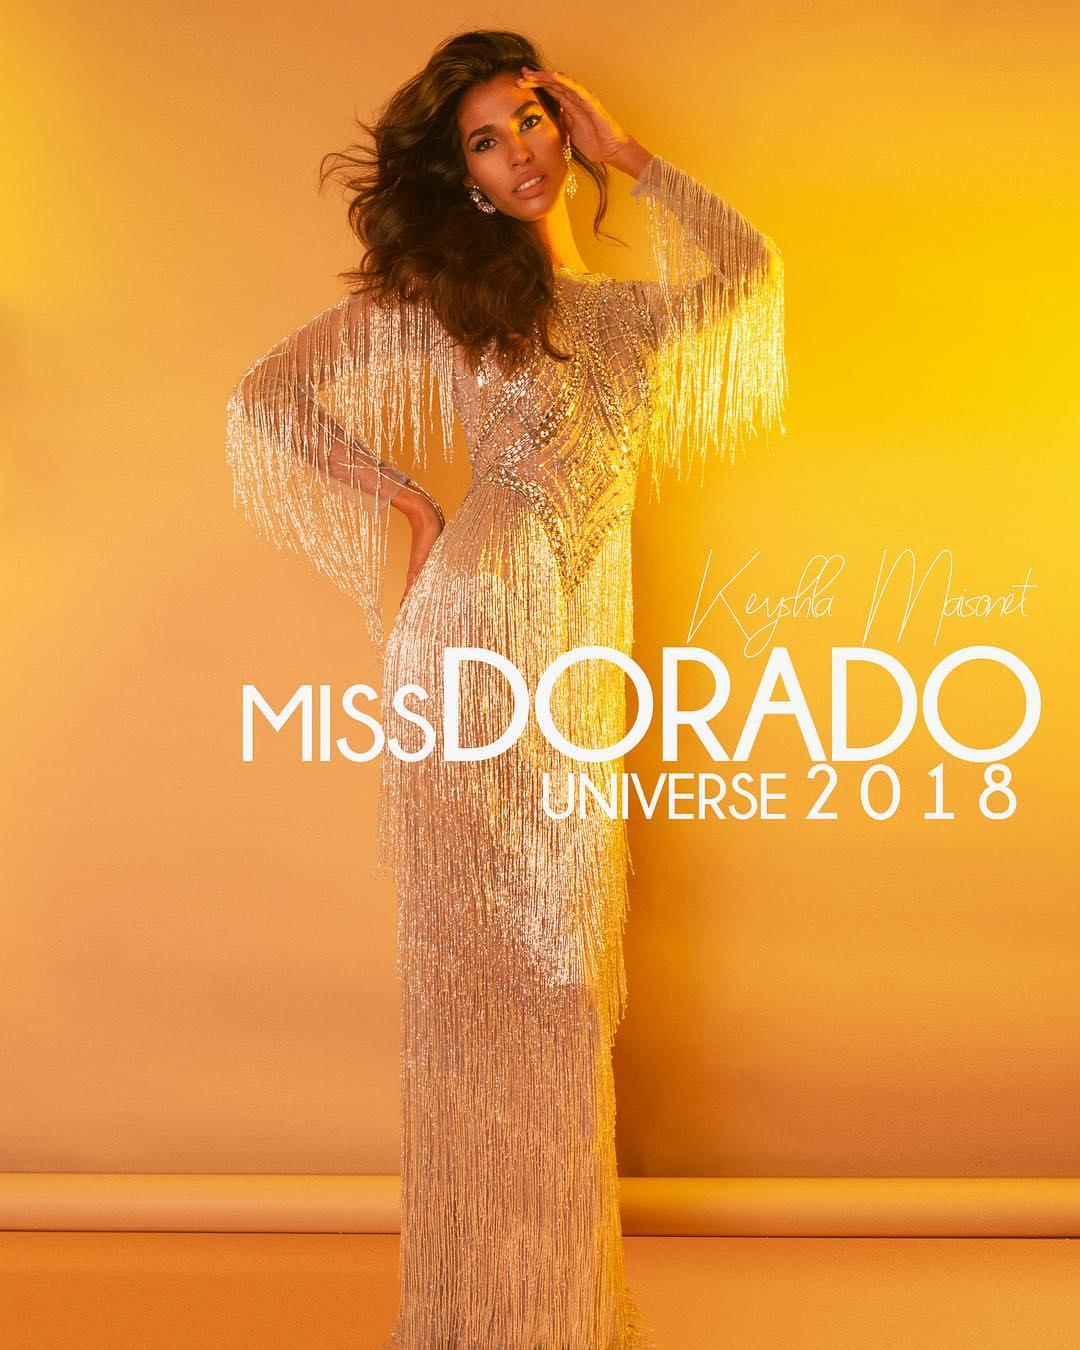 keyshla maaisonet, miss dorado universe 2018. - Página 4 Tvodem10